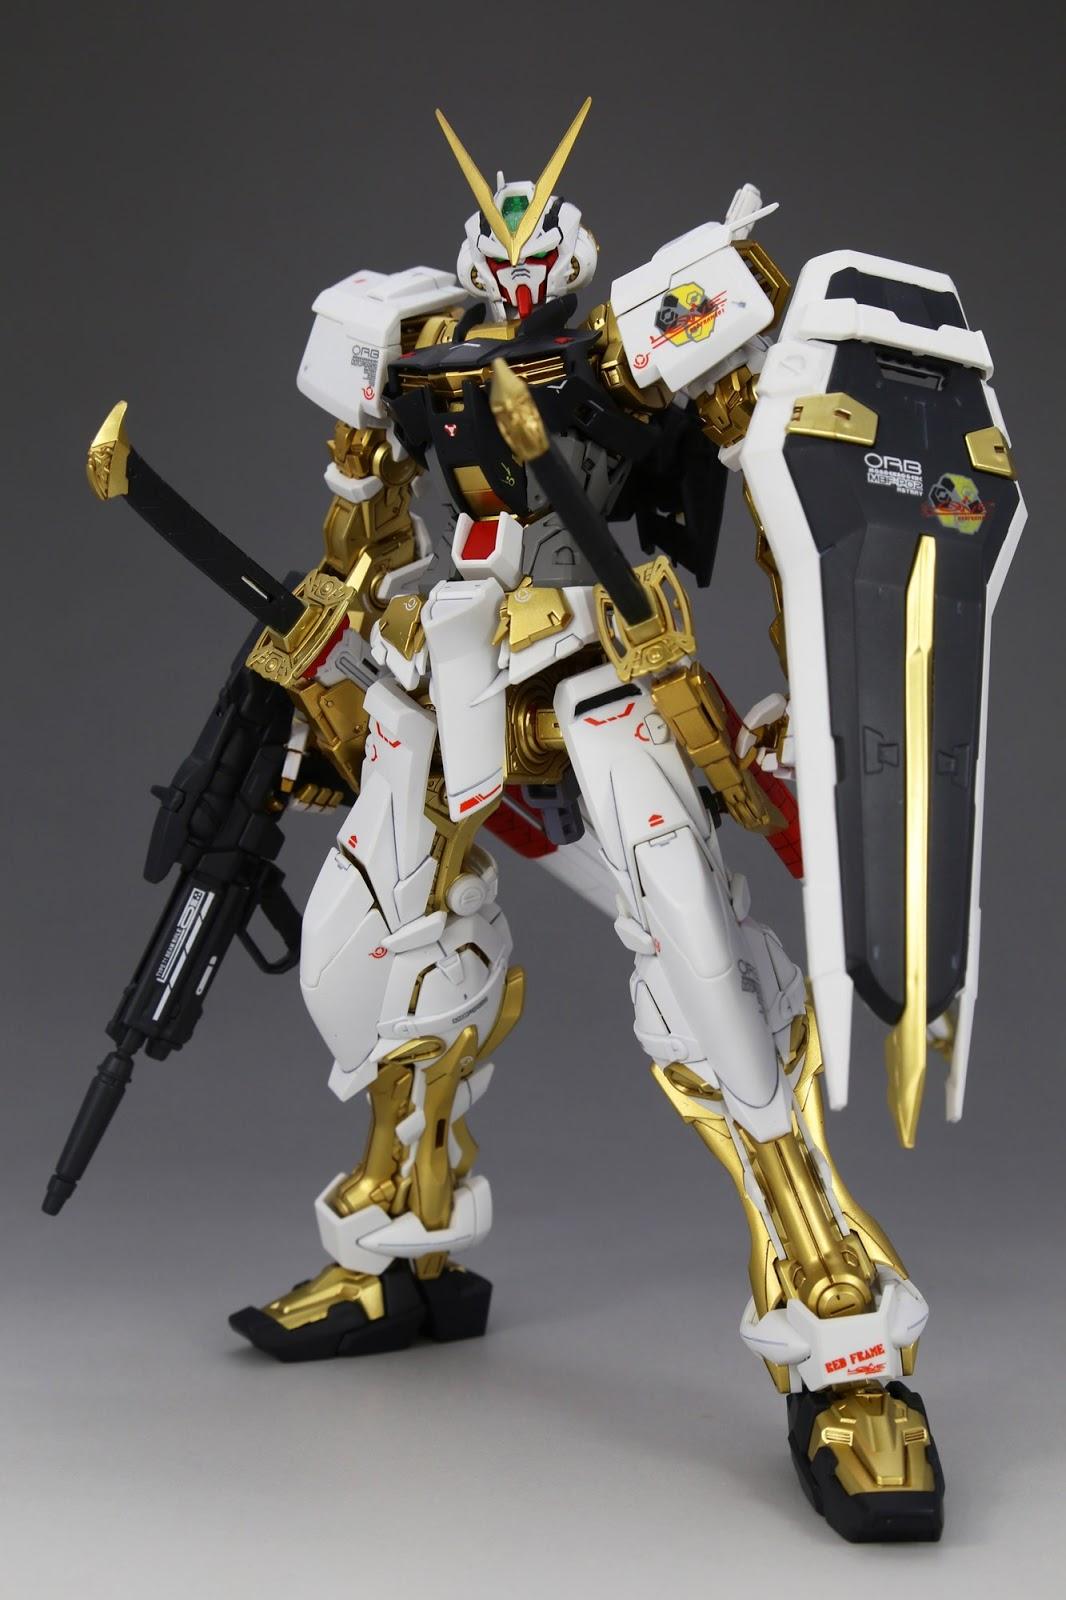 GUNDAM GUY: MG 1/100 Gundam Astray Gold Frame - Painted Build